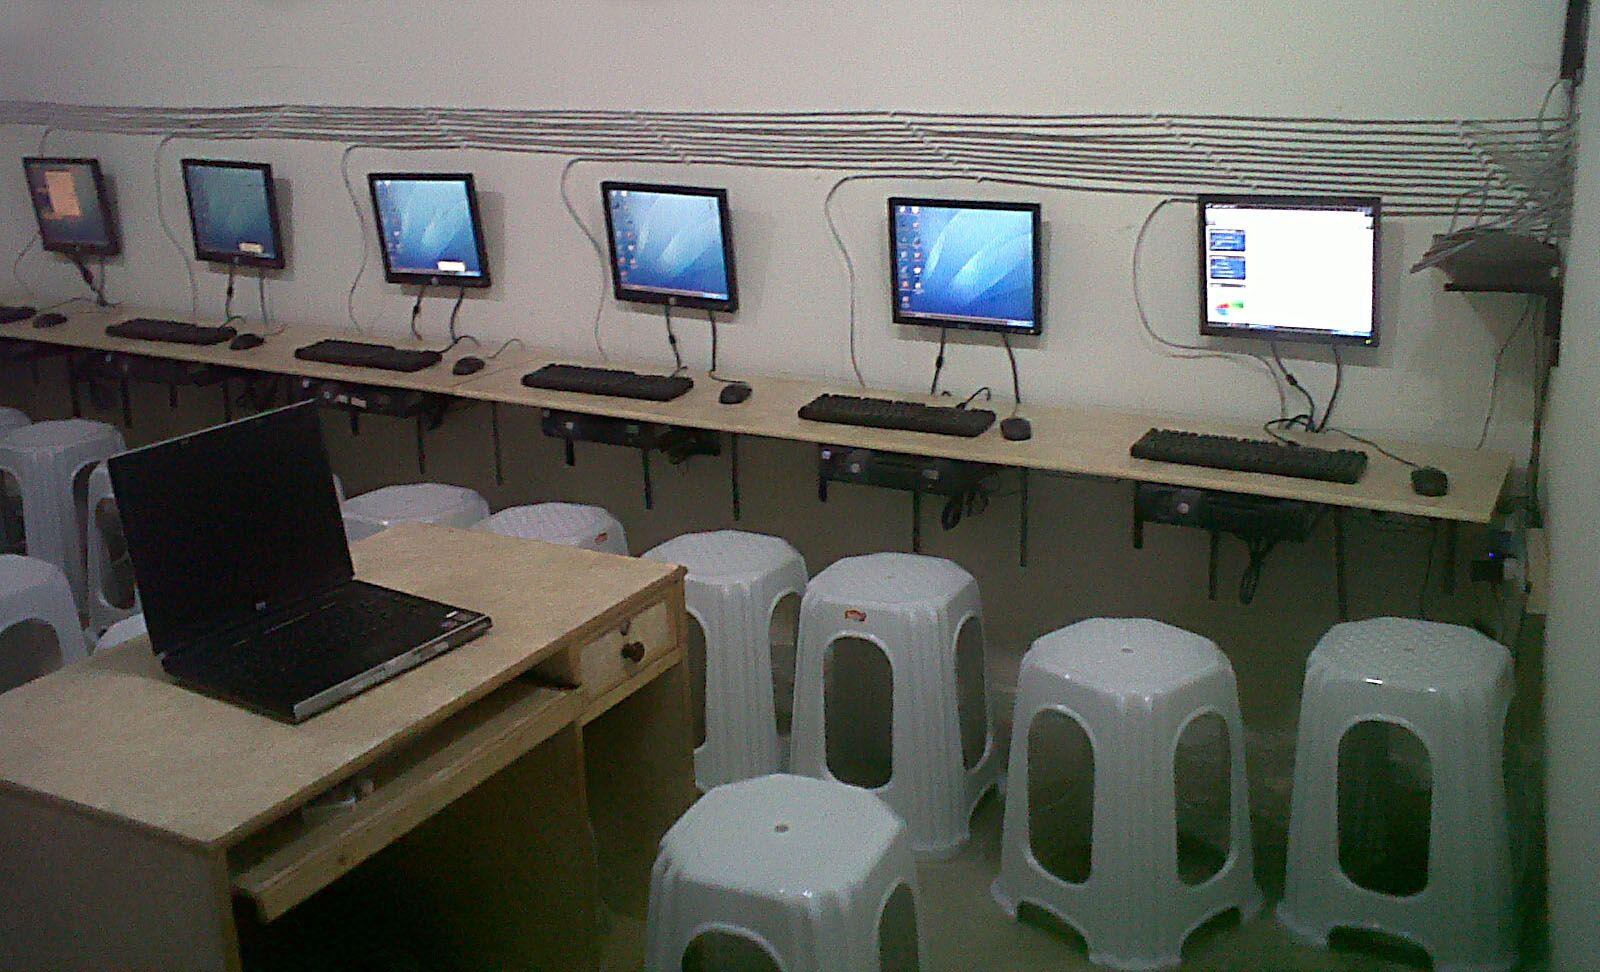 Computer Lab | LABORATORIO DE COMPUTO | Pinterest | Laboratorios